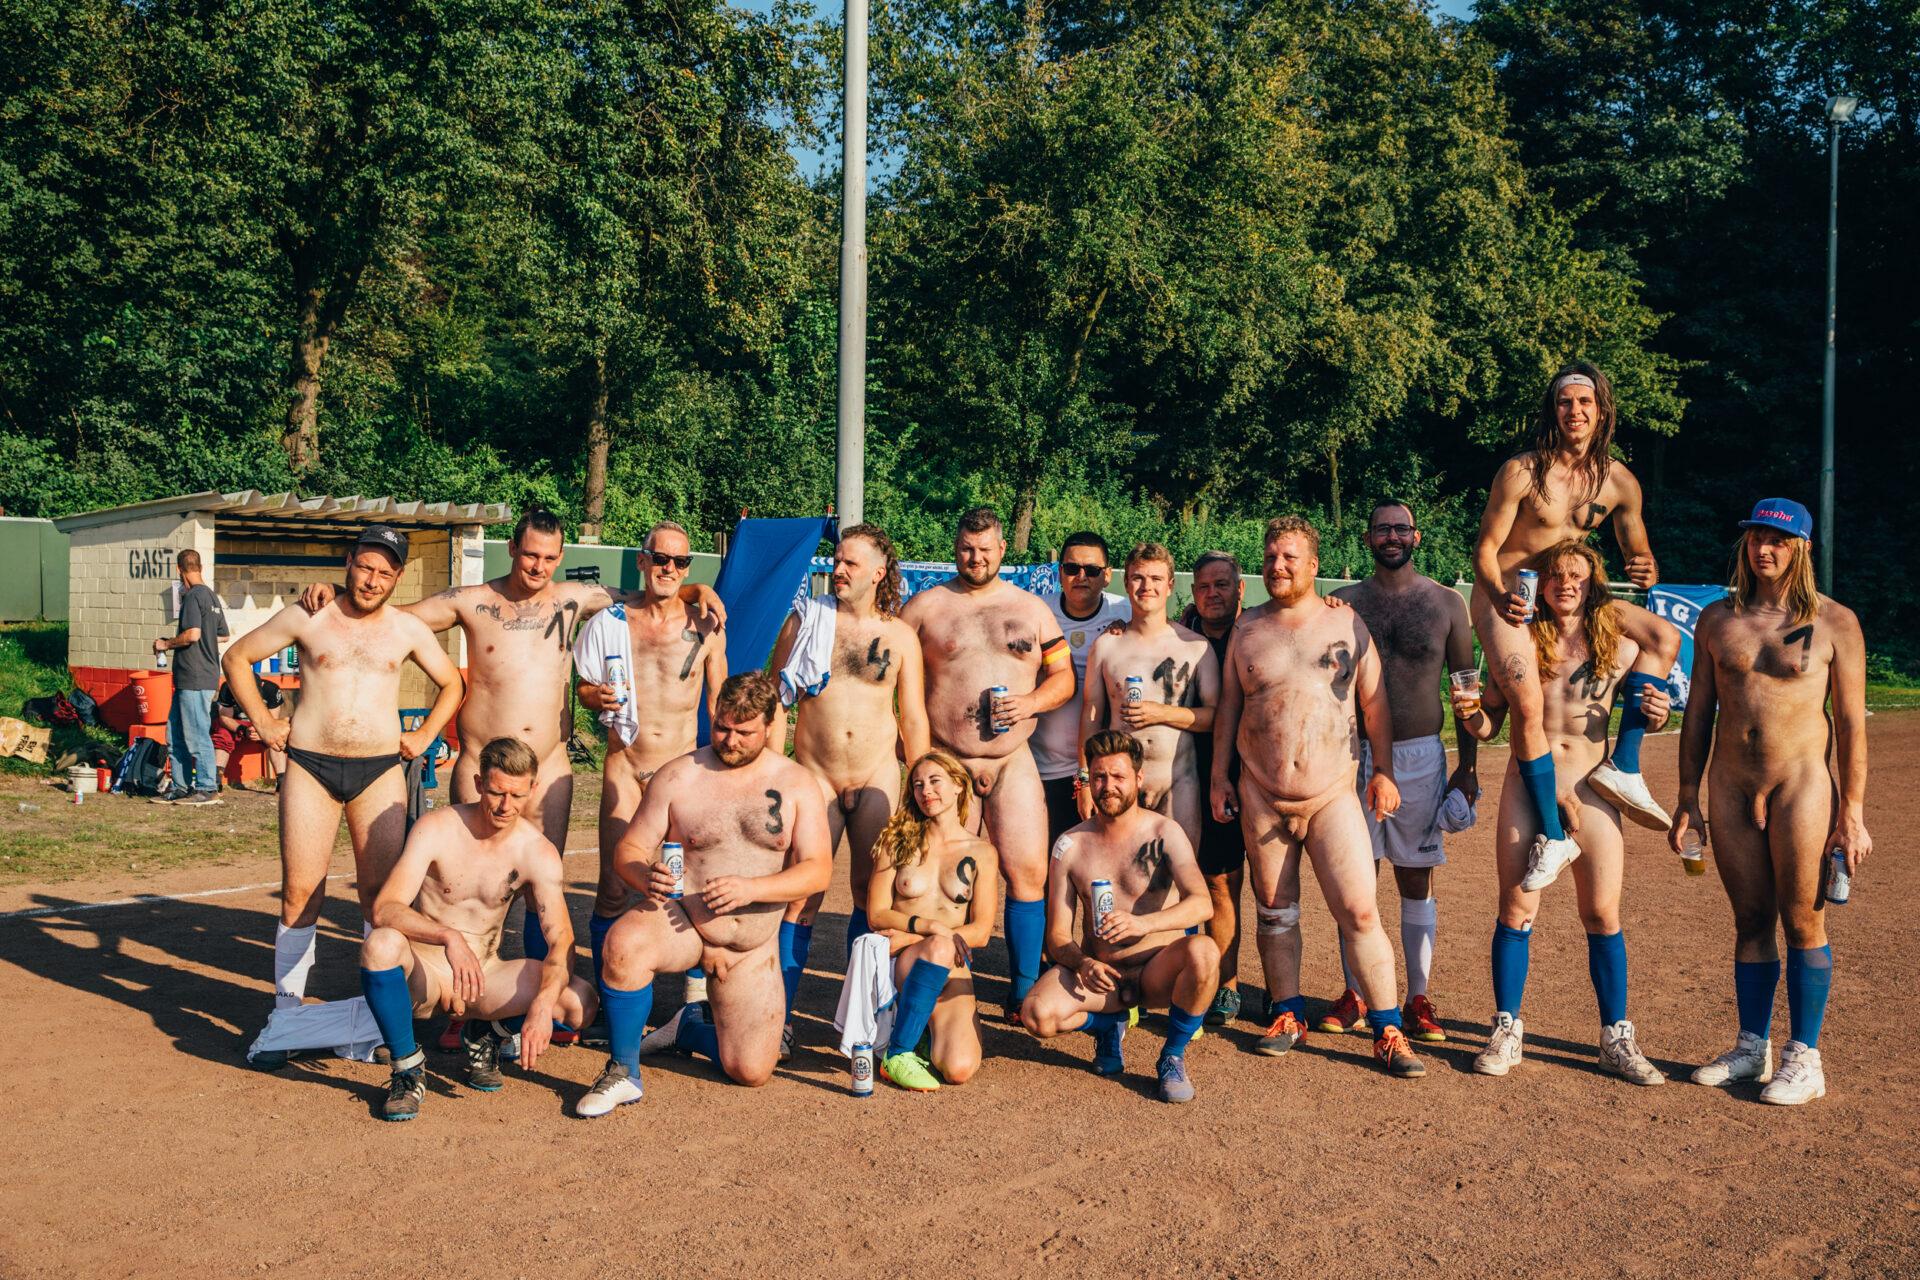 Gezocht: naakte Friese voetballers